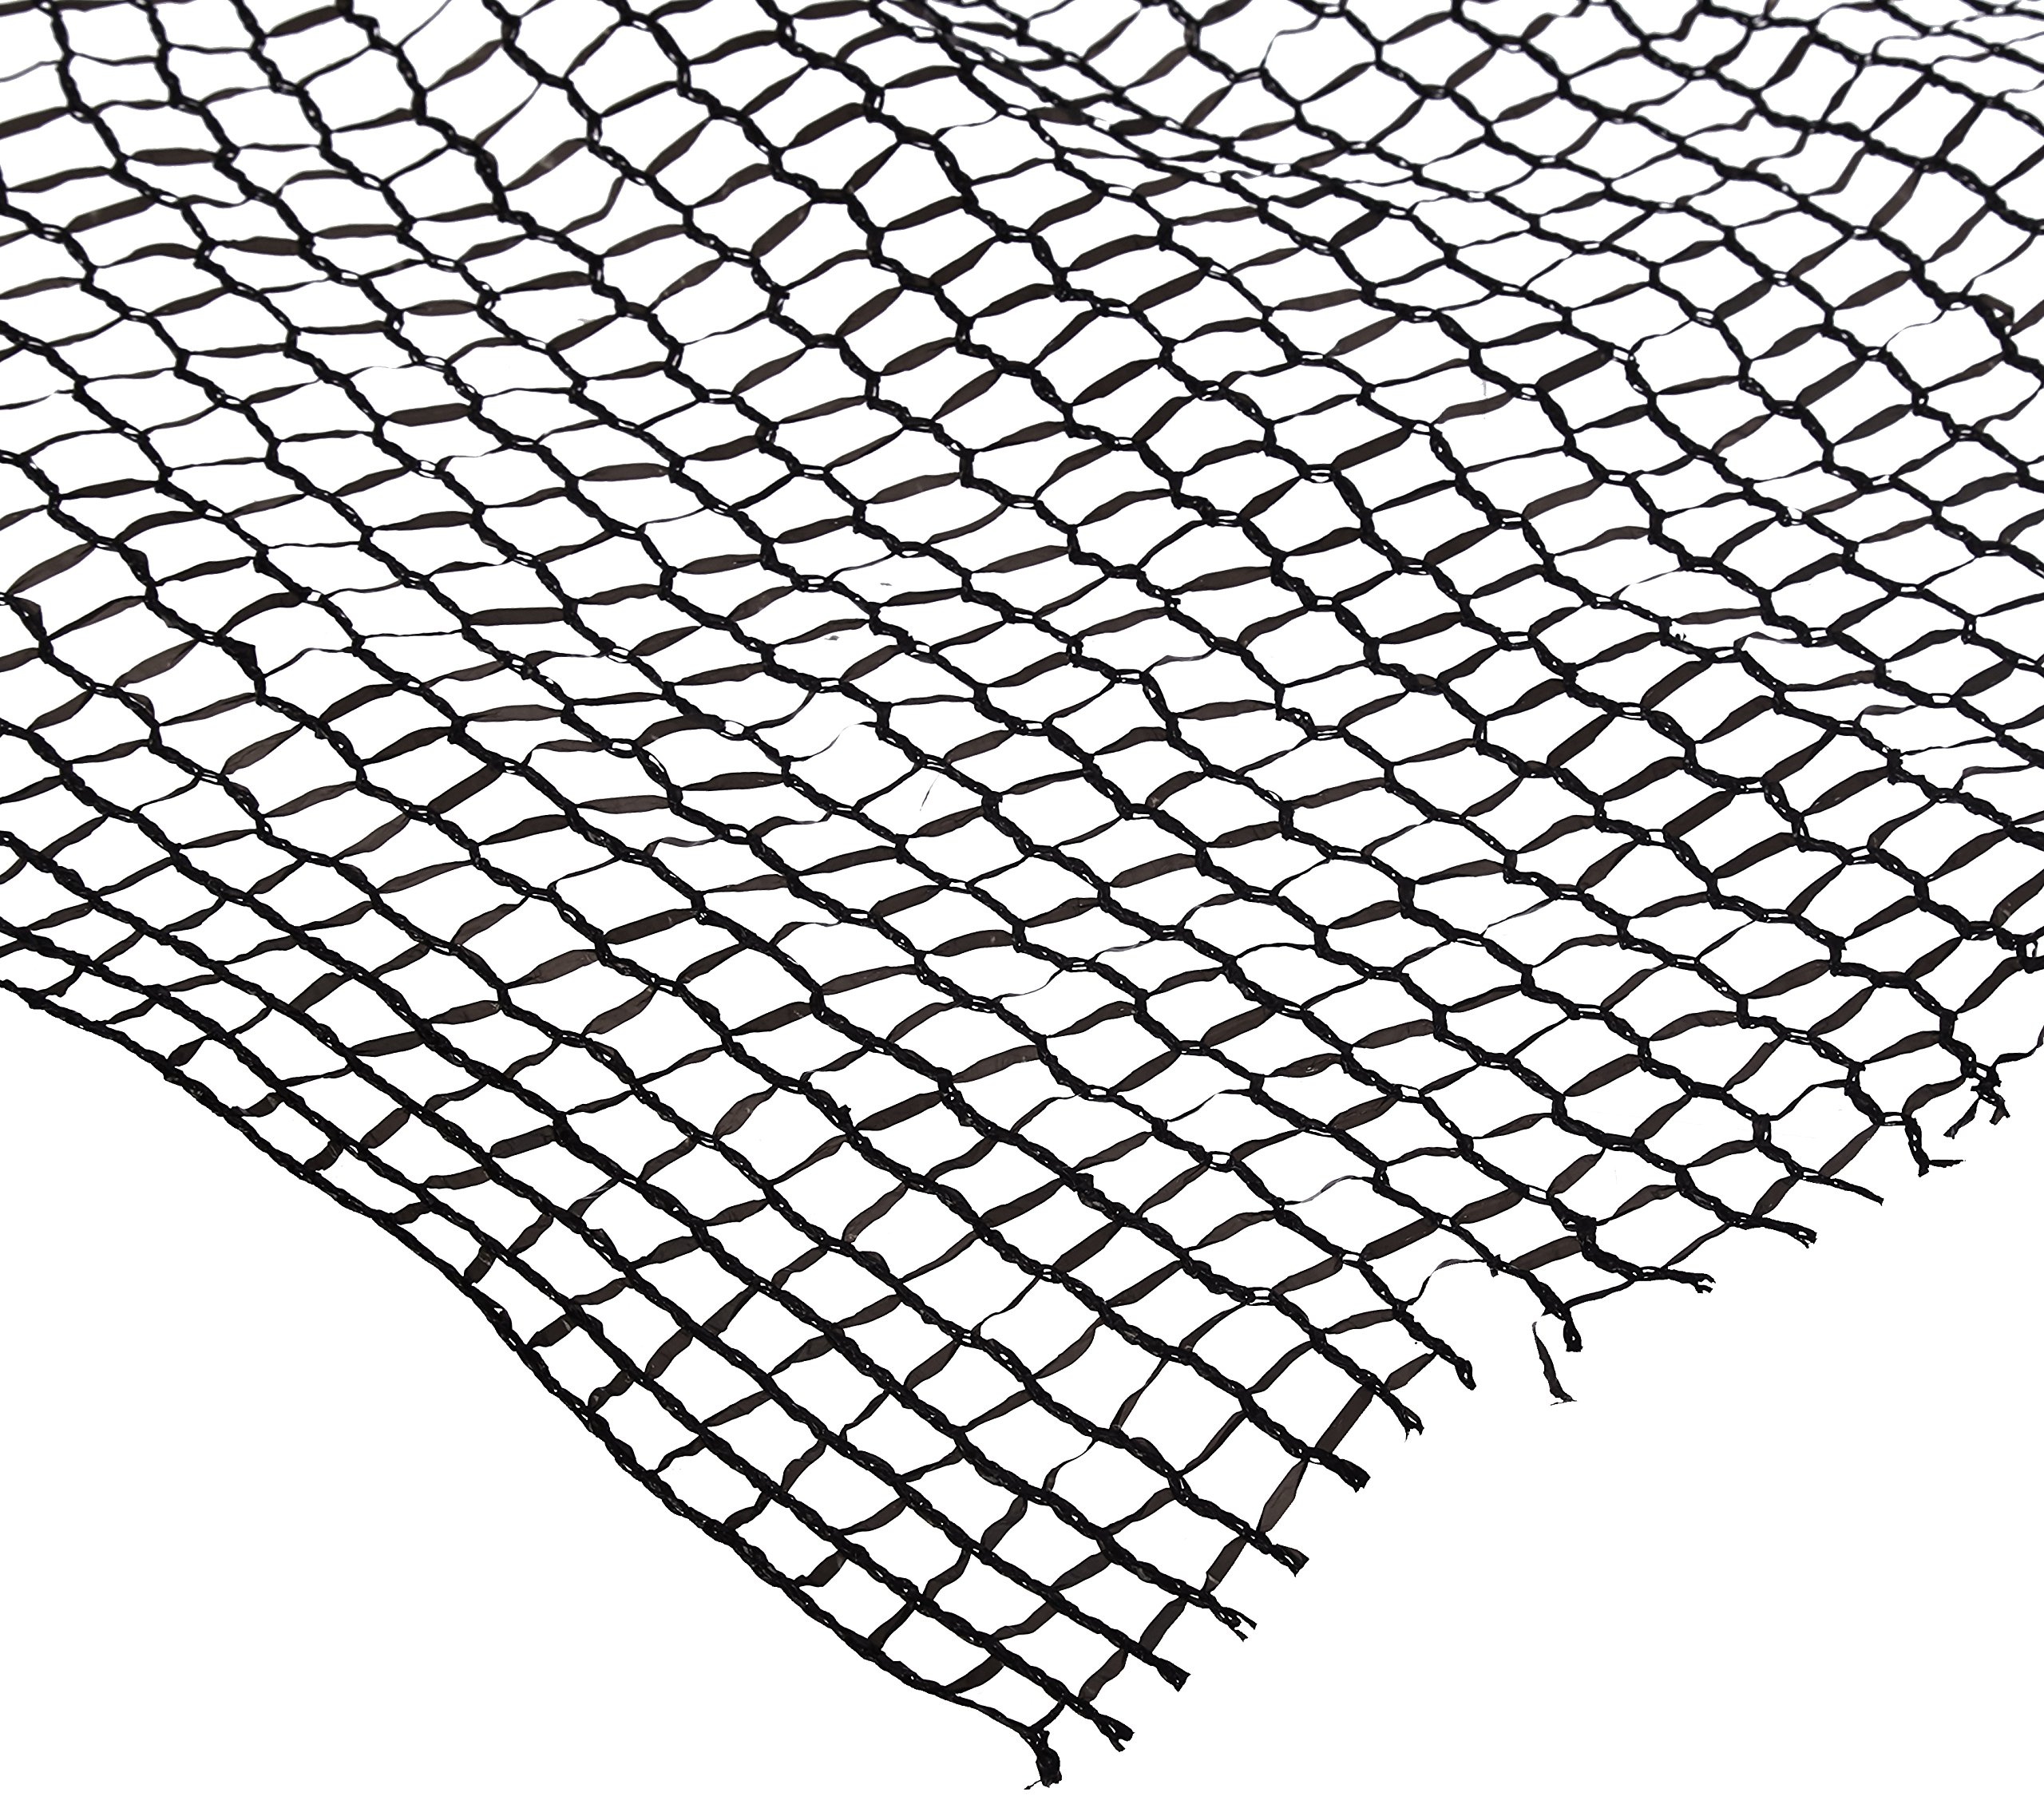 Dewitt 14-Foot by 14-Foot Bird Barricade Deluxe Netting 1/4-Inch Mesh BB1414DLX